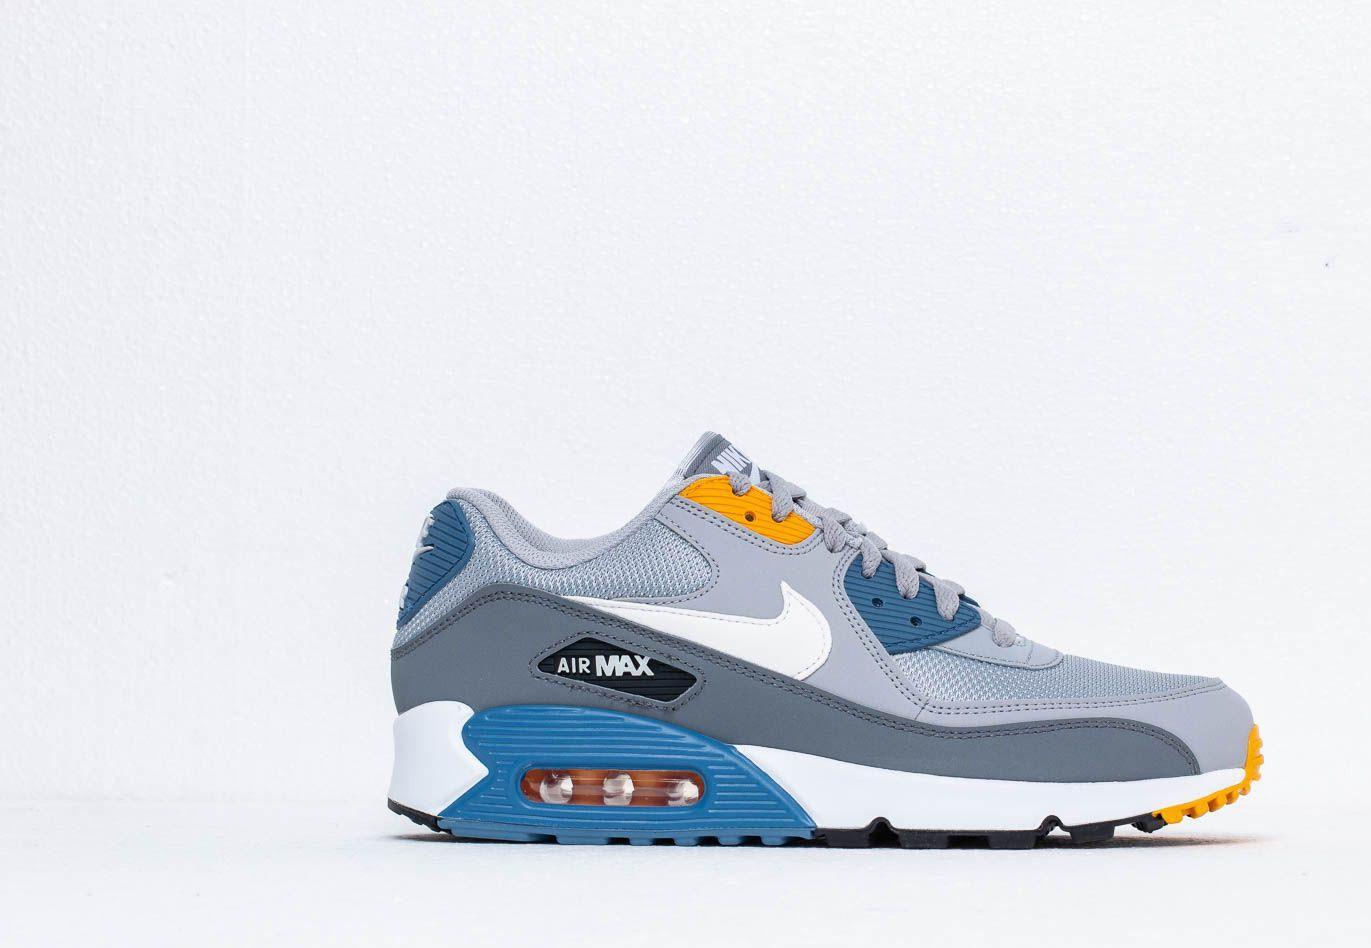 Nike Air Max 90 Wolf Grey White Indigo Storm | HYPEBEAST